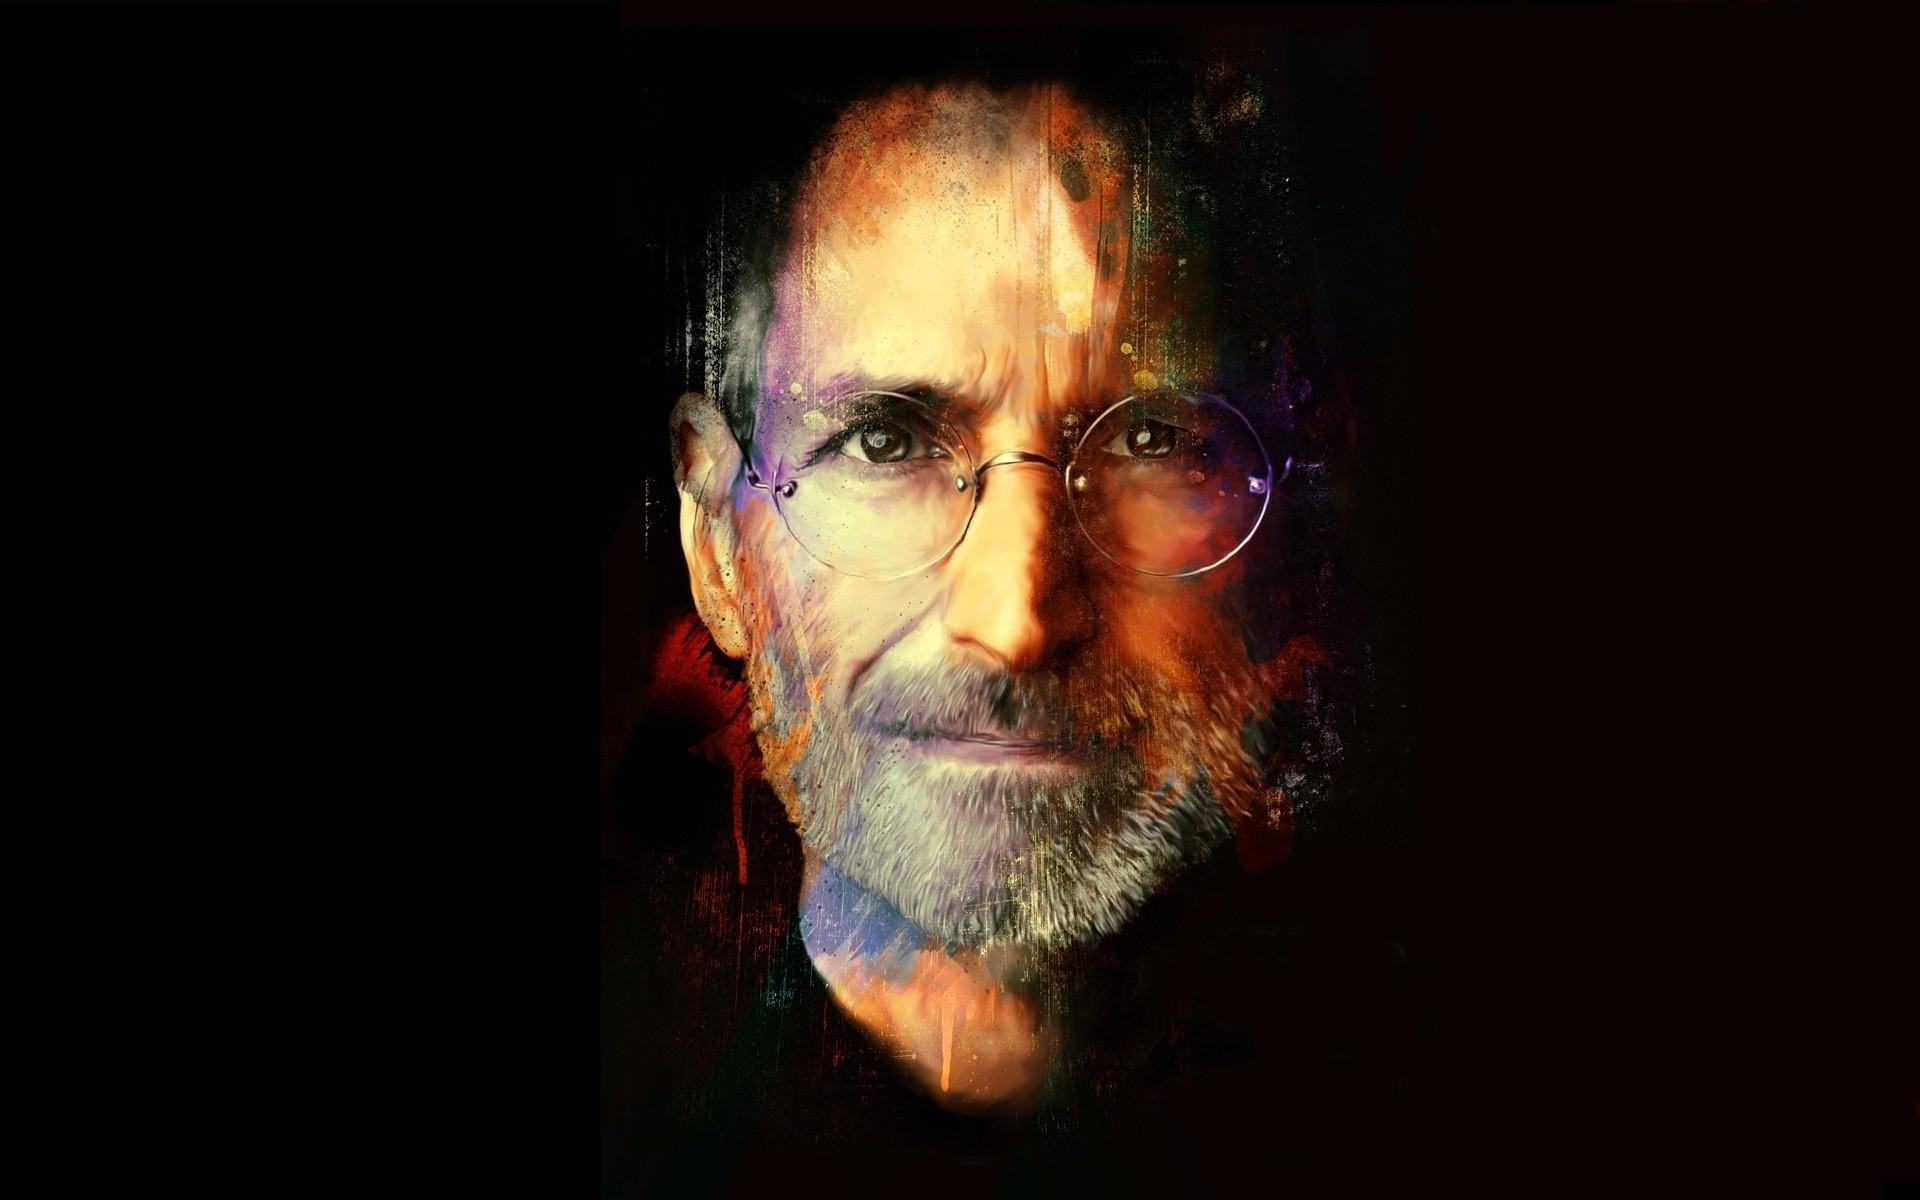 Steve Jobs wallpaper 2736 1920x1200